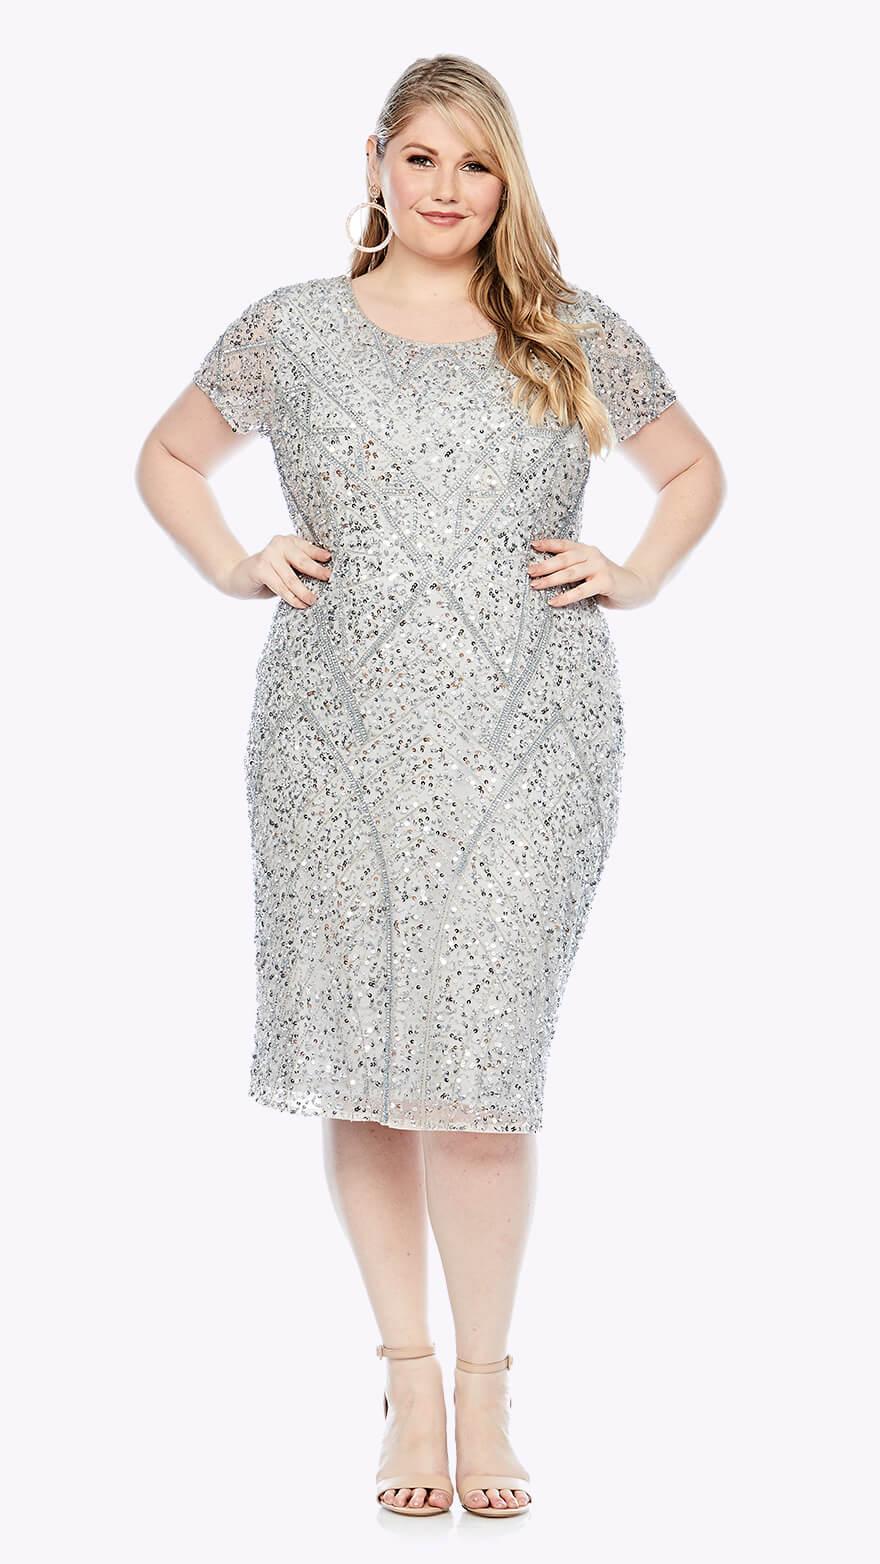 LJ0368 Mid-length dress in geometric beaded design with short sleeve